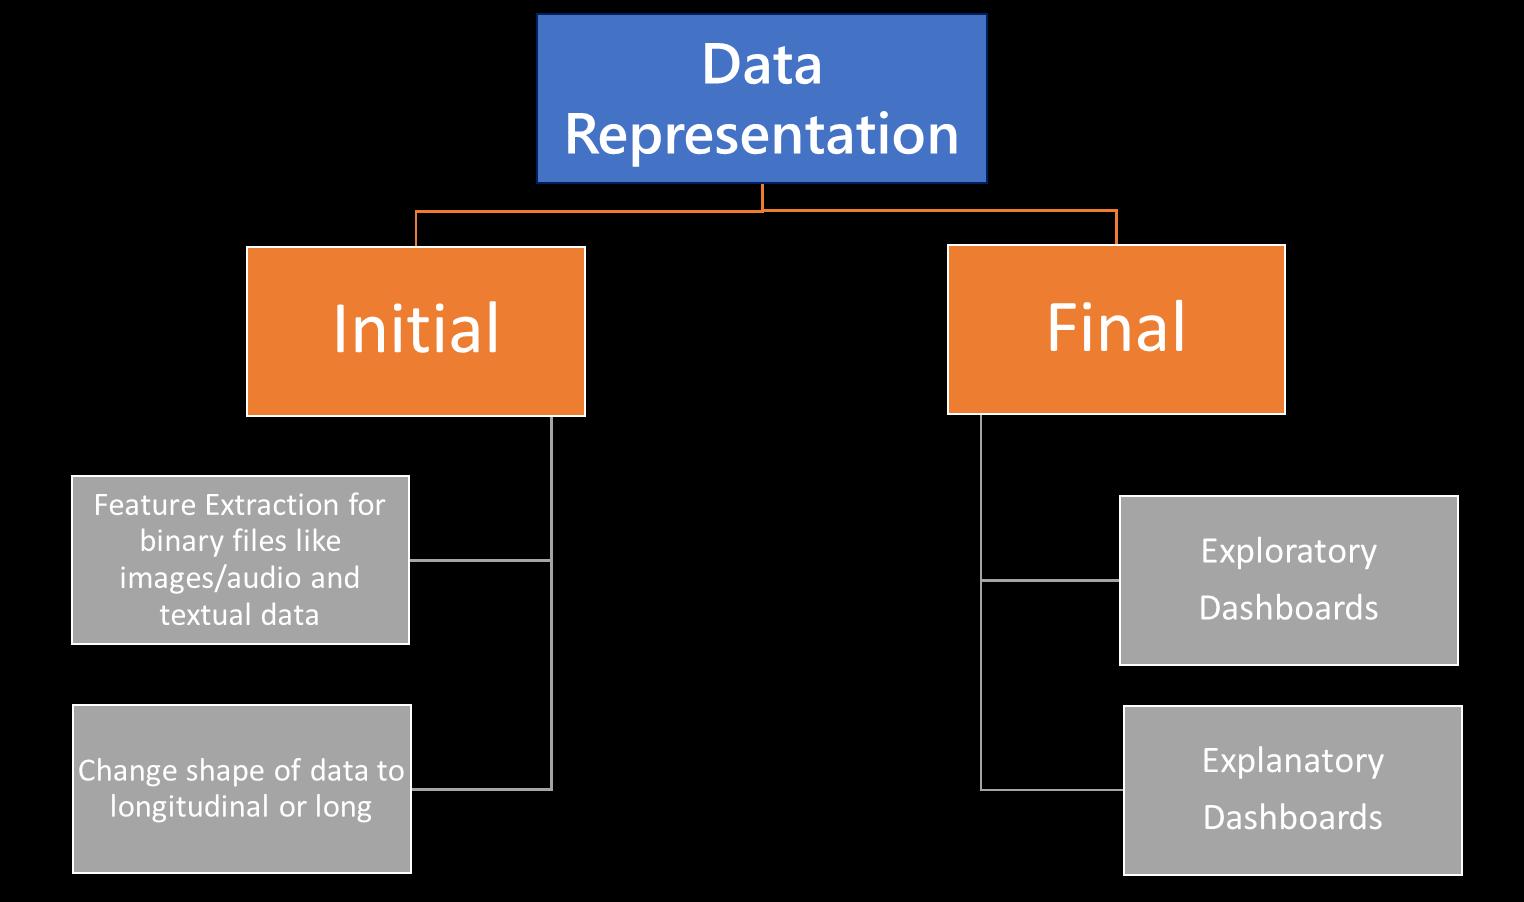 Data Representation